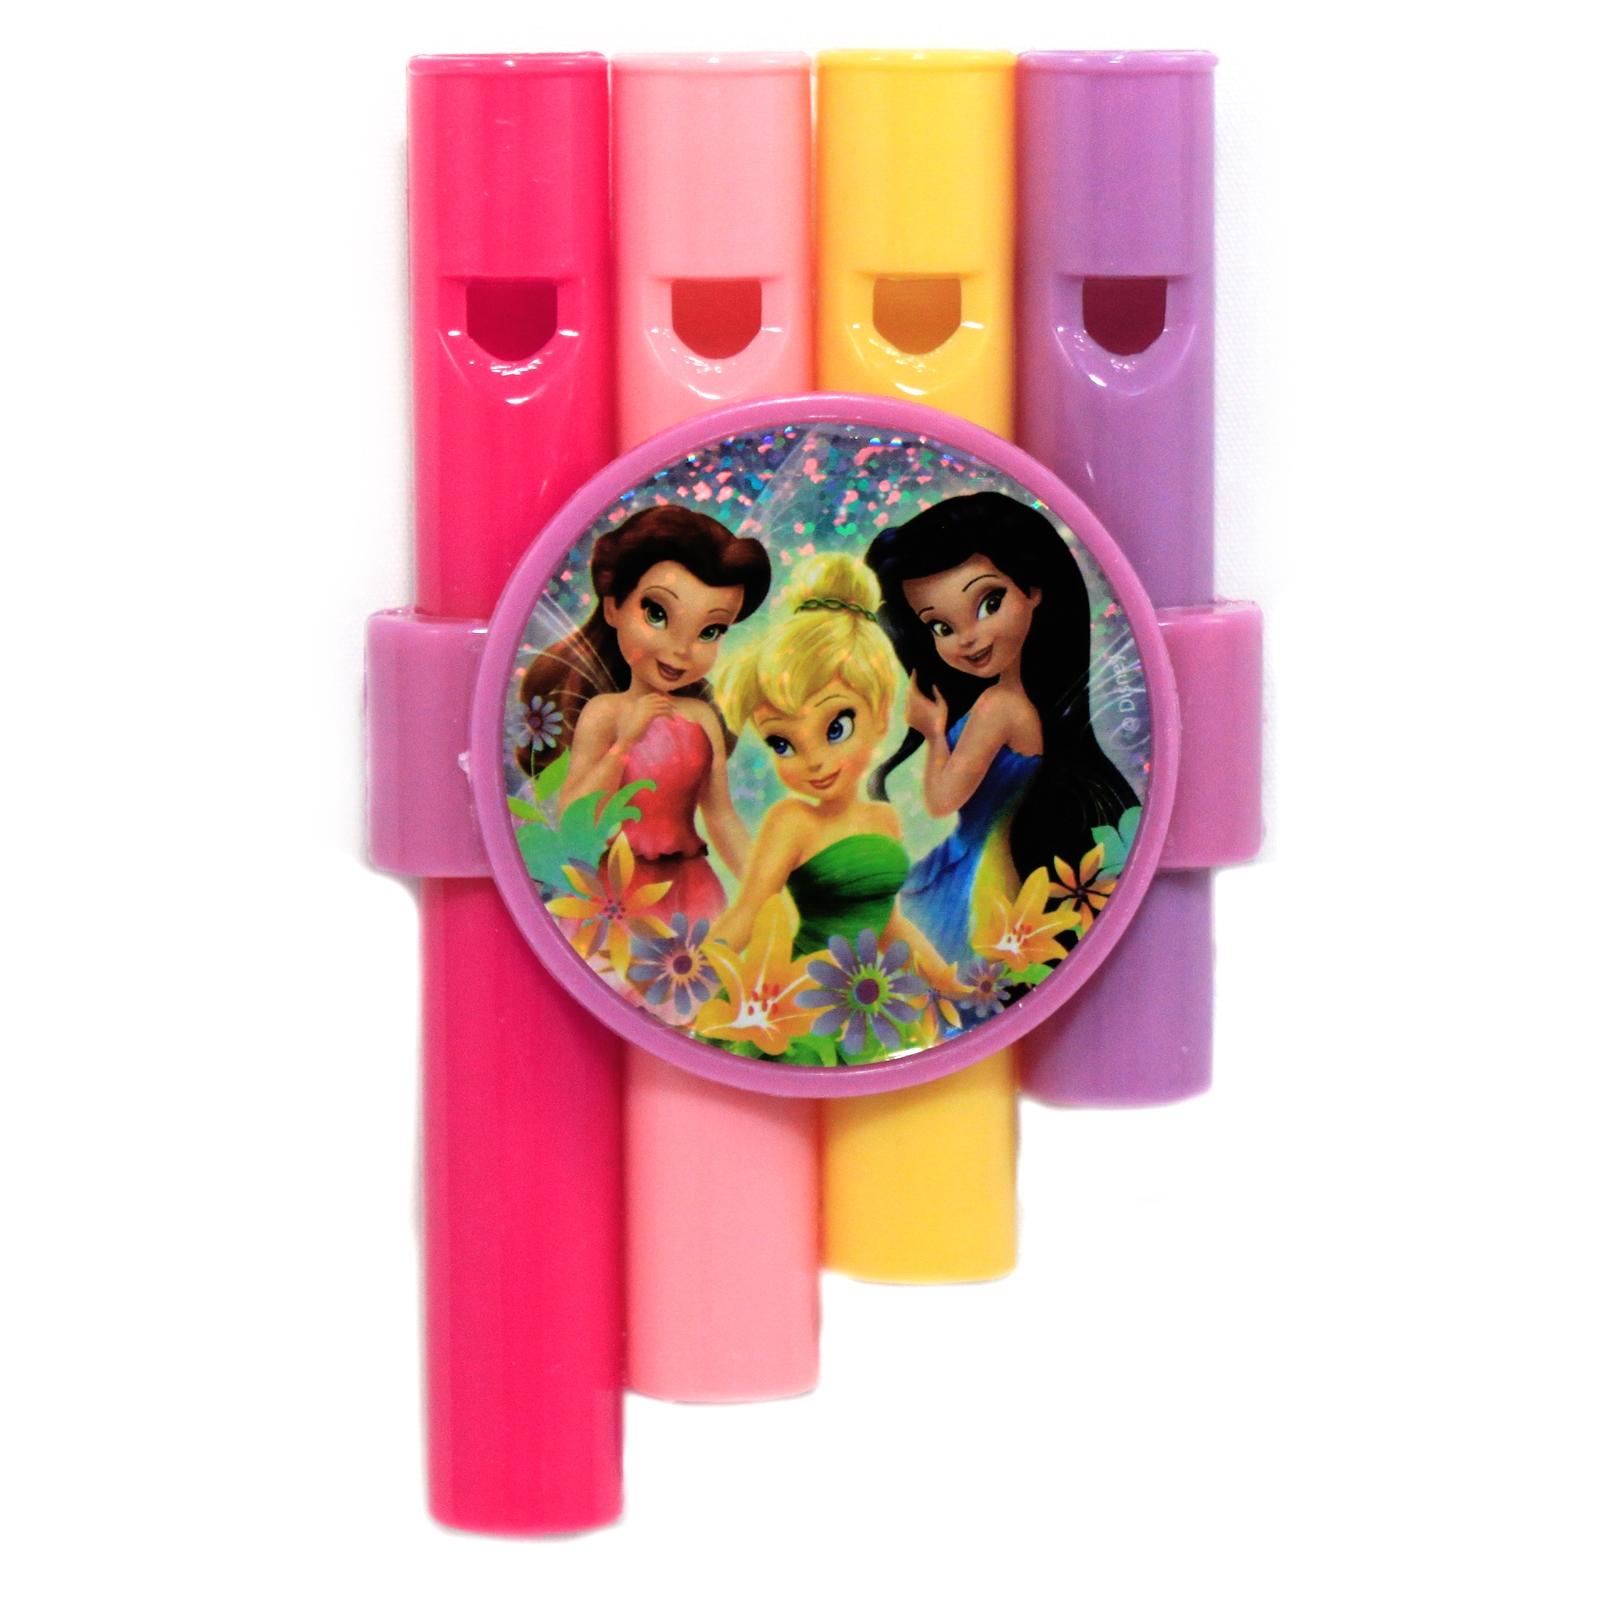 Disney Tinkerbell Fairies 4 Way Flute